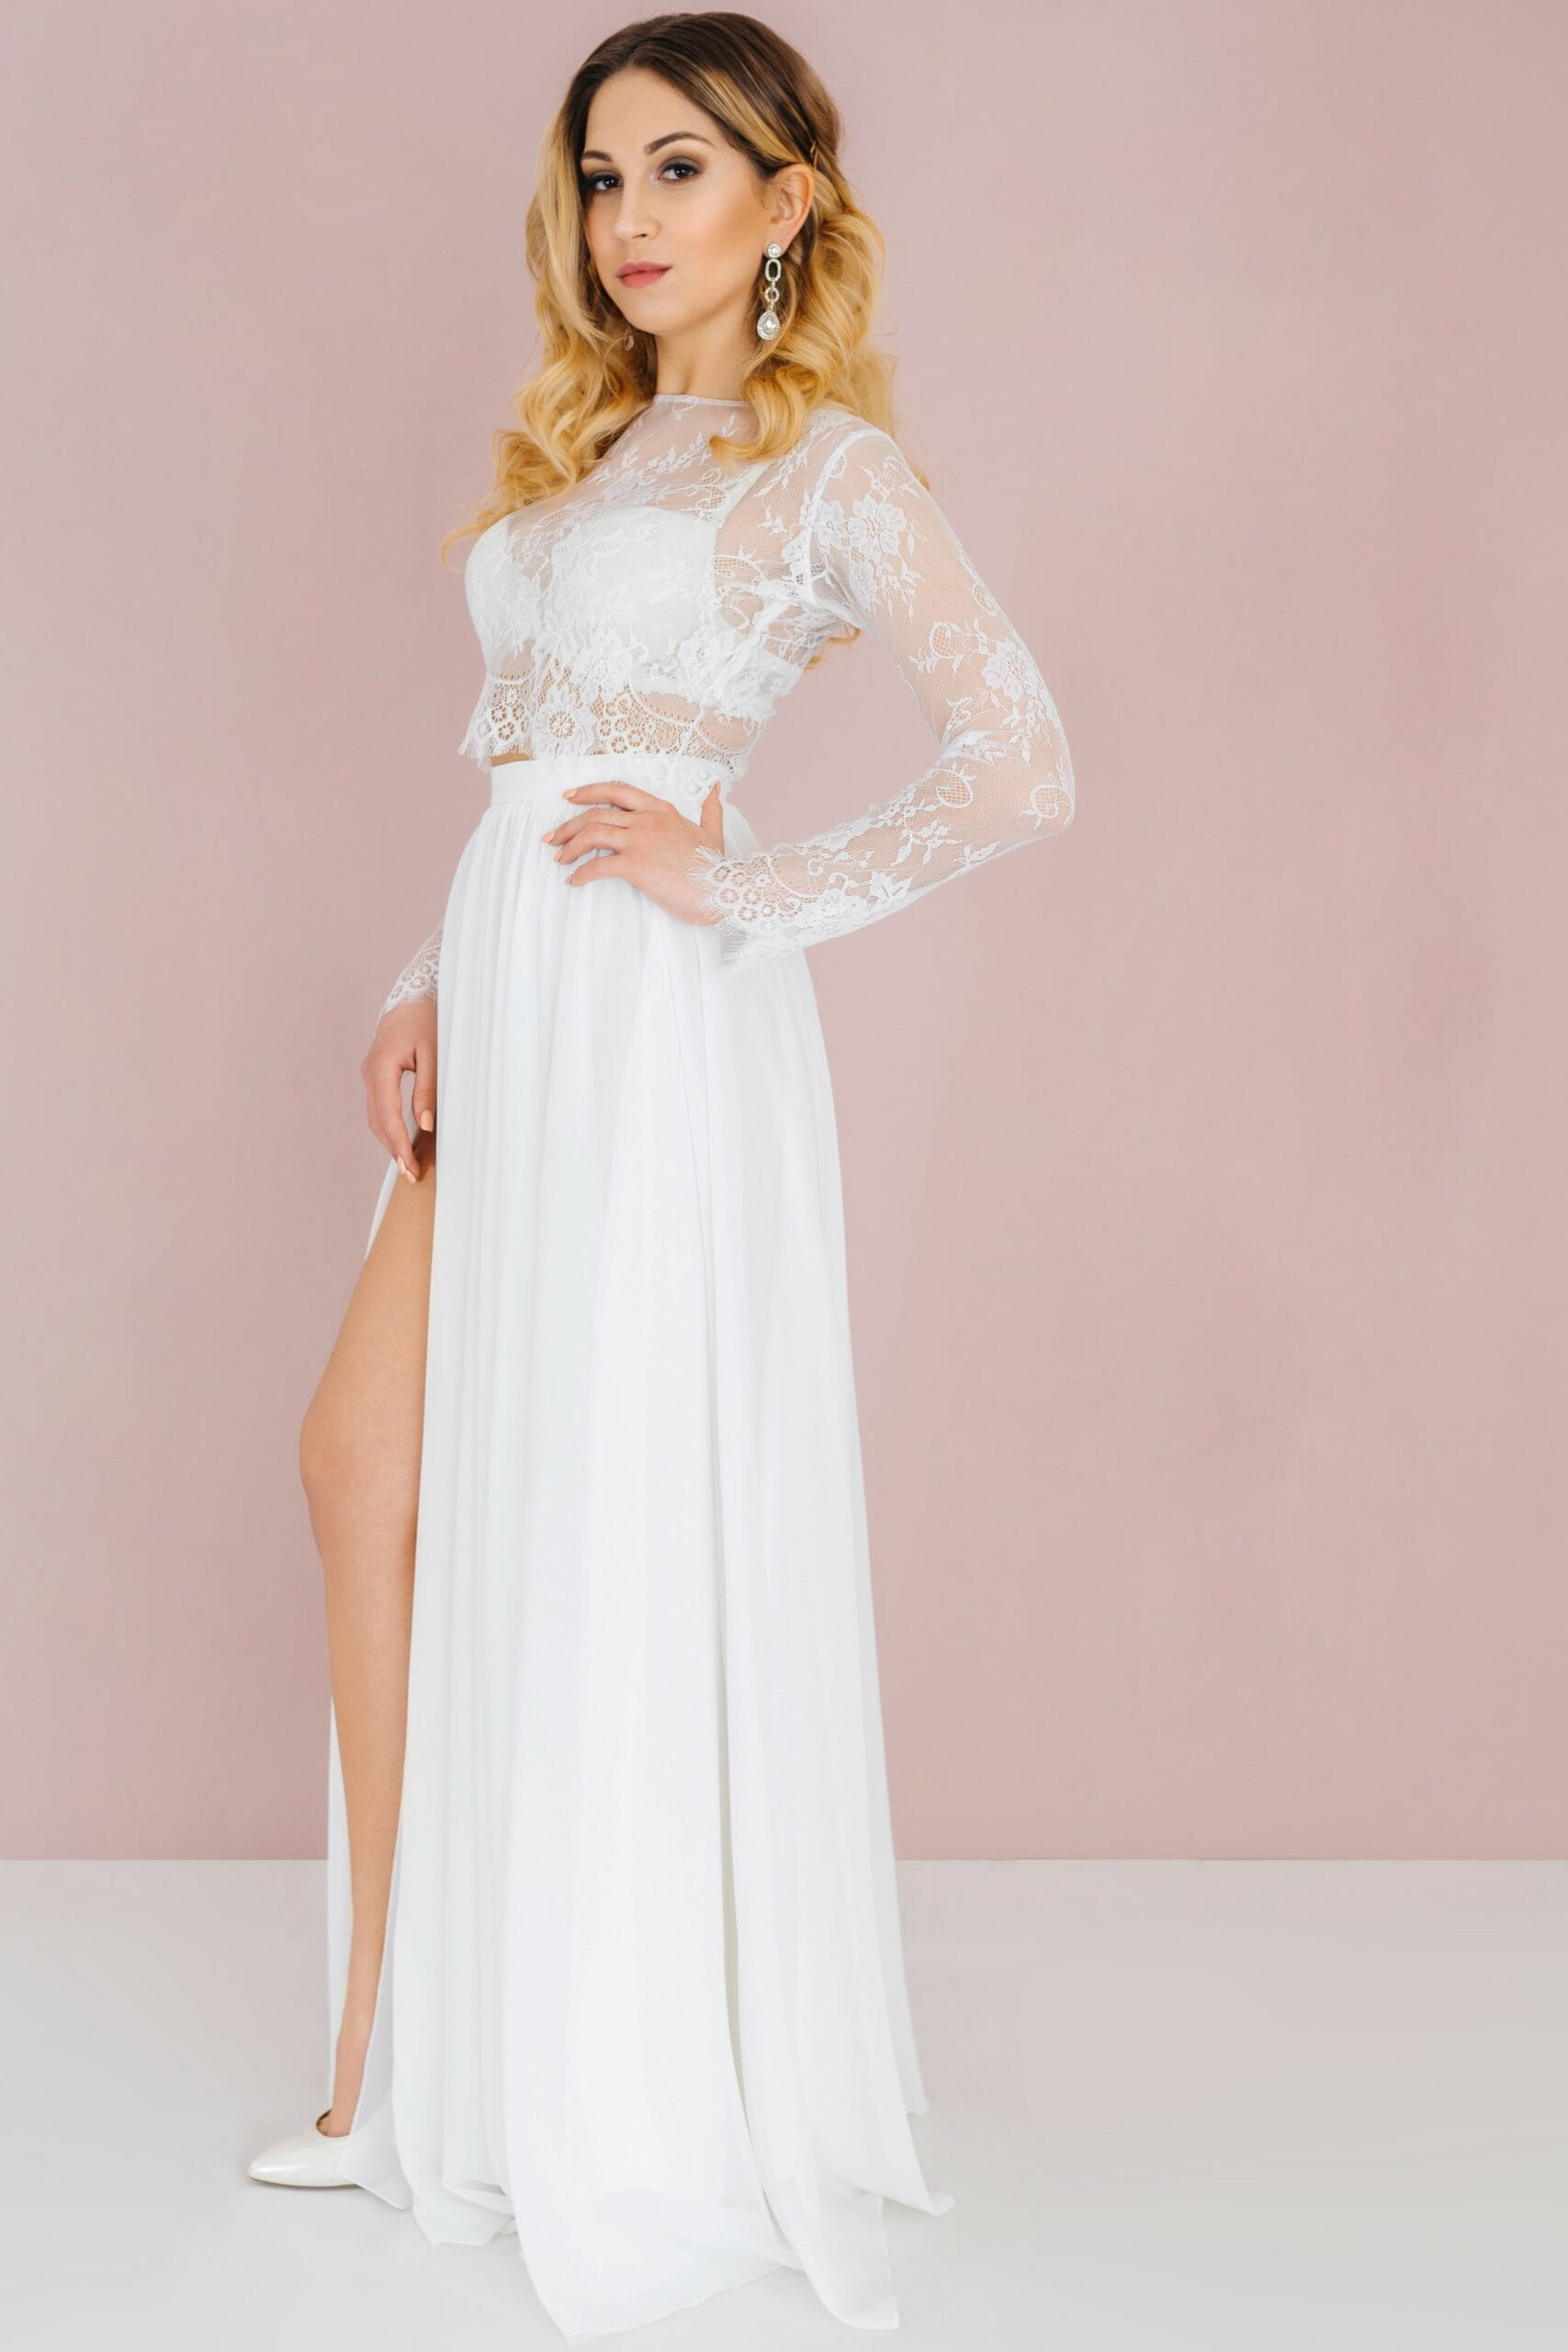 Свадебное платье CHALSIE, коллекция LOFT, бренд RARE BRIDAL, фото 1